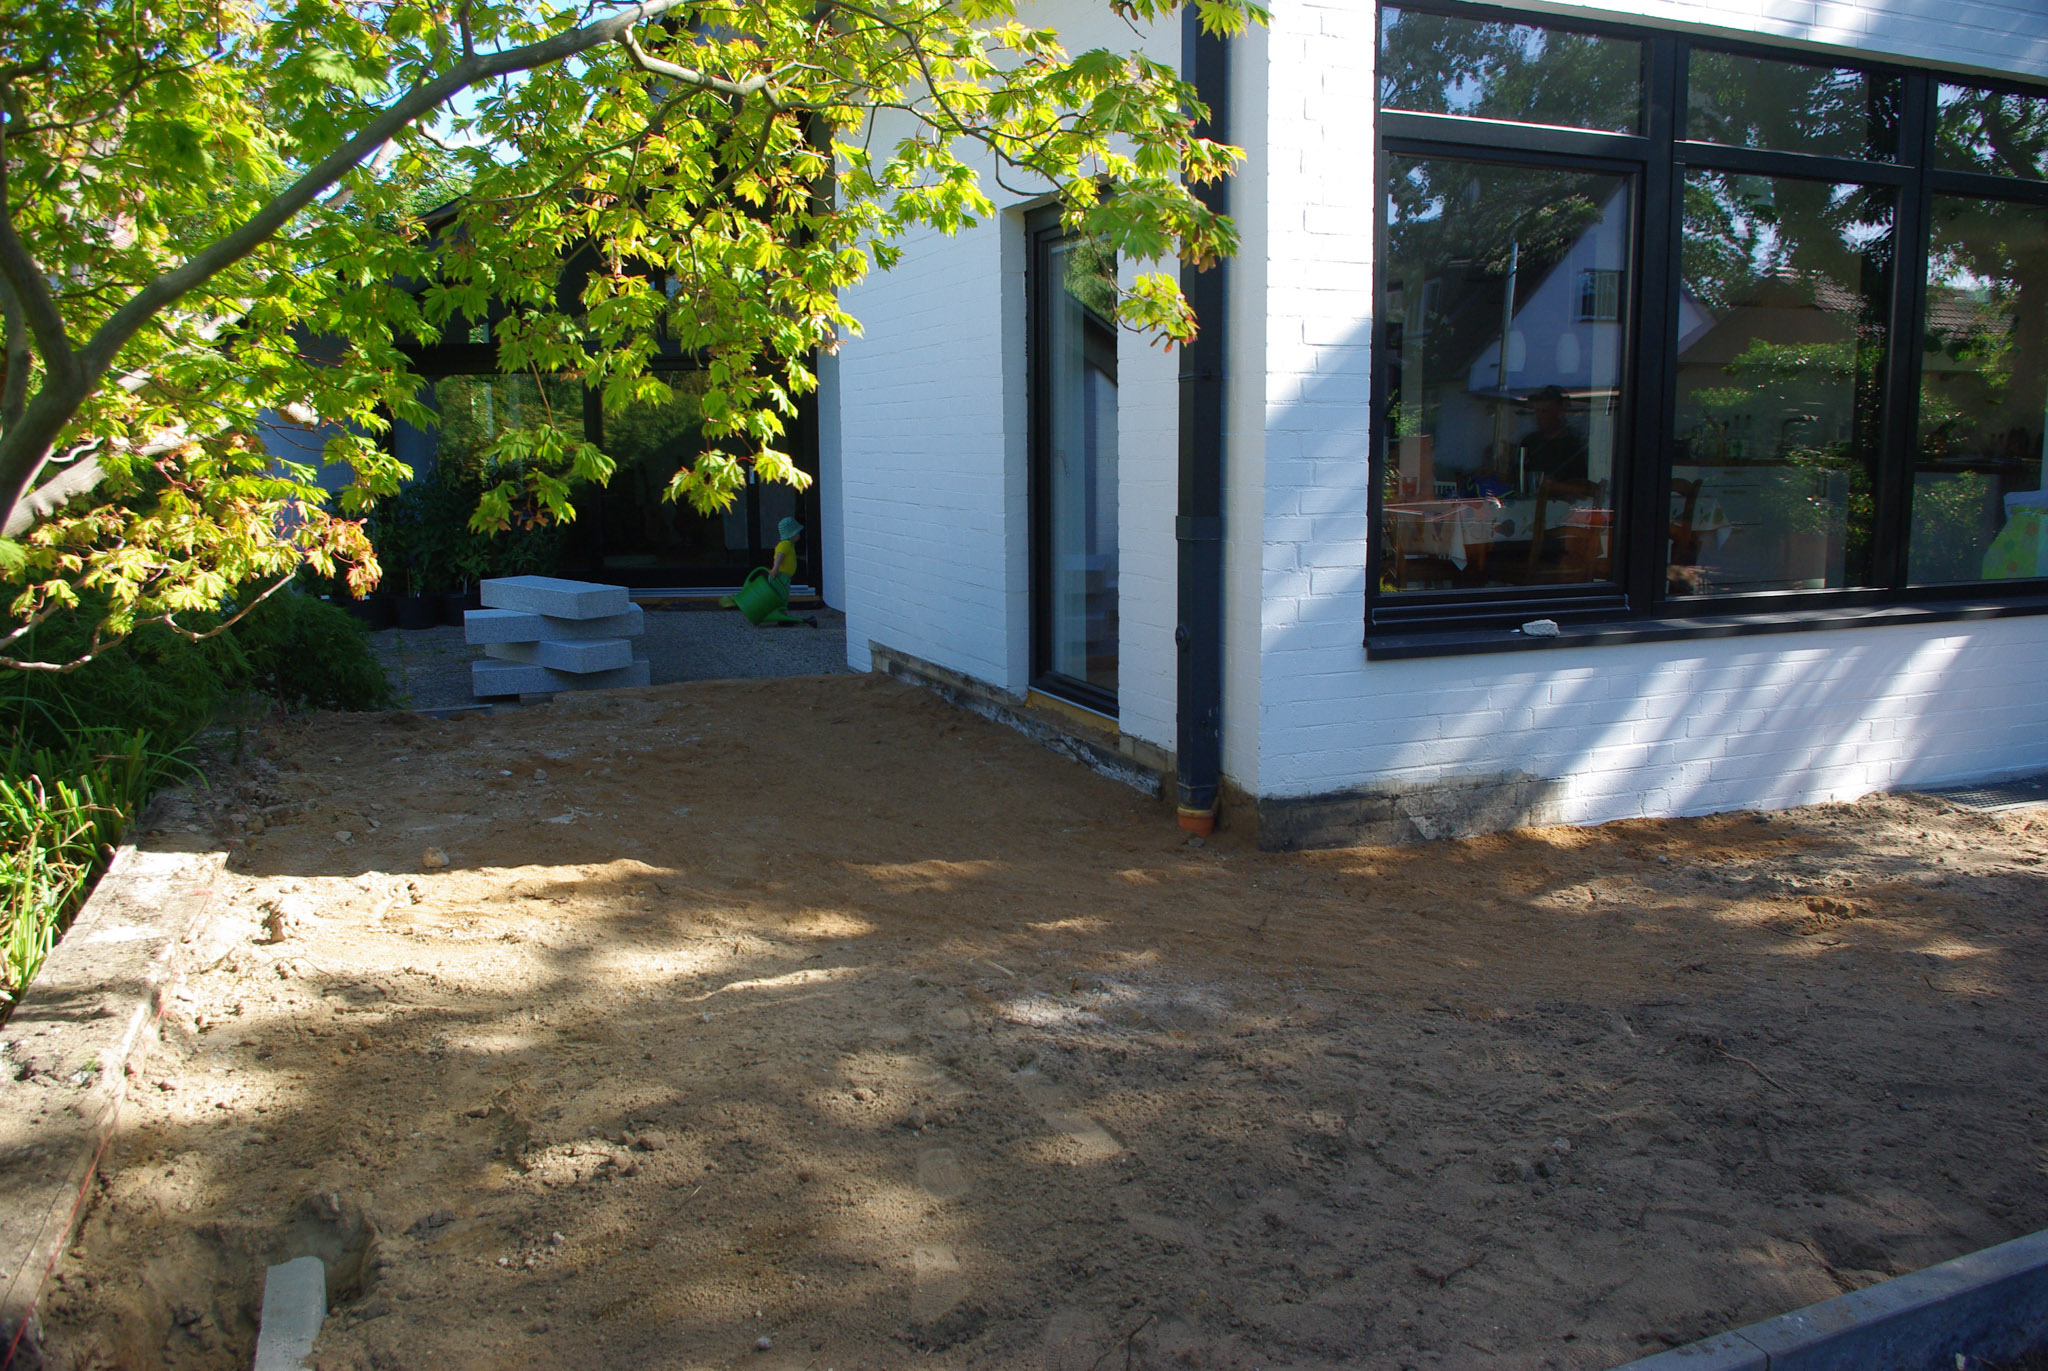 Holzterrasse-Schritt-1